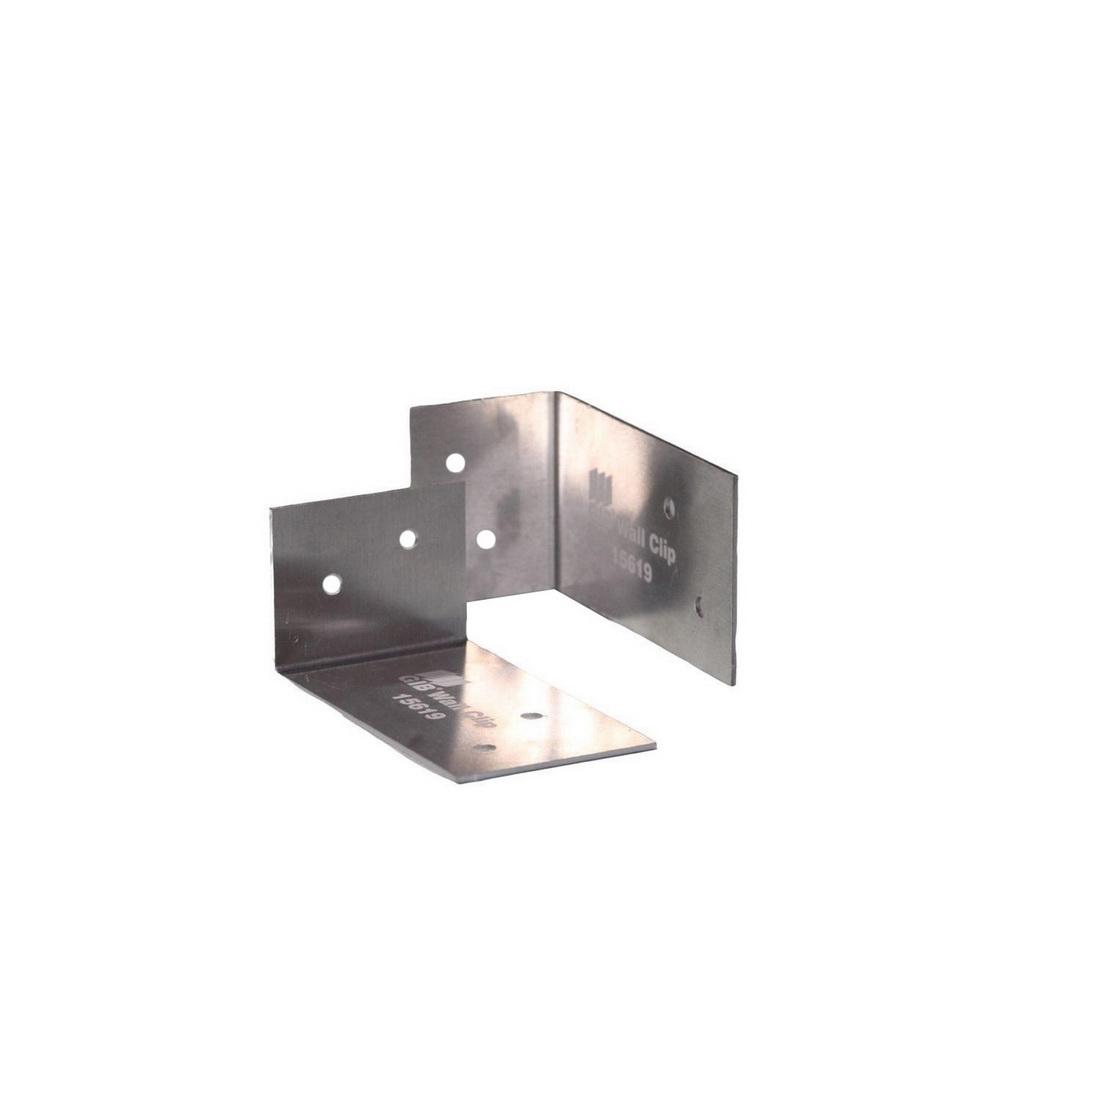 90x40x50mm Wall Clip Aluminium Barrierline